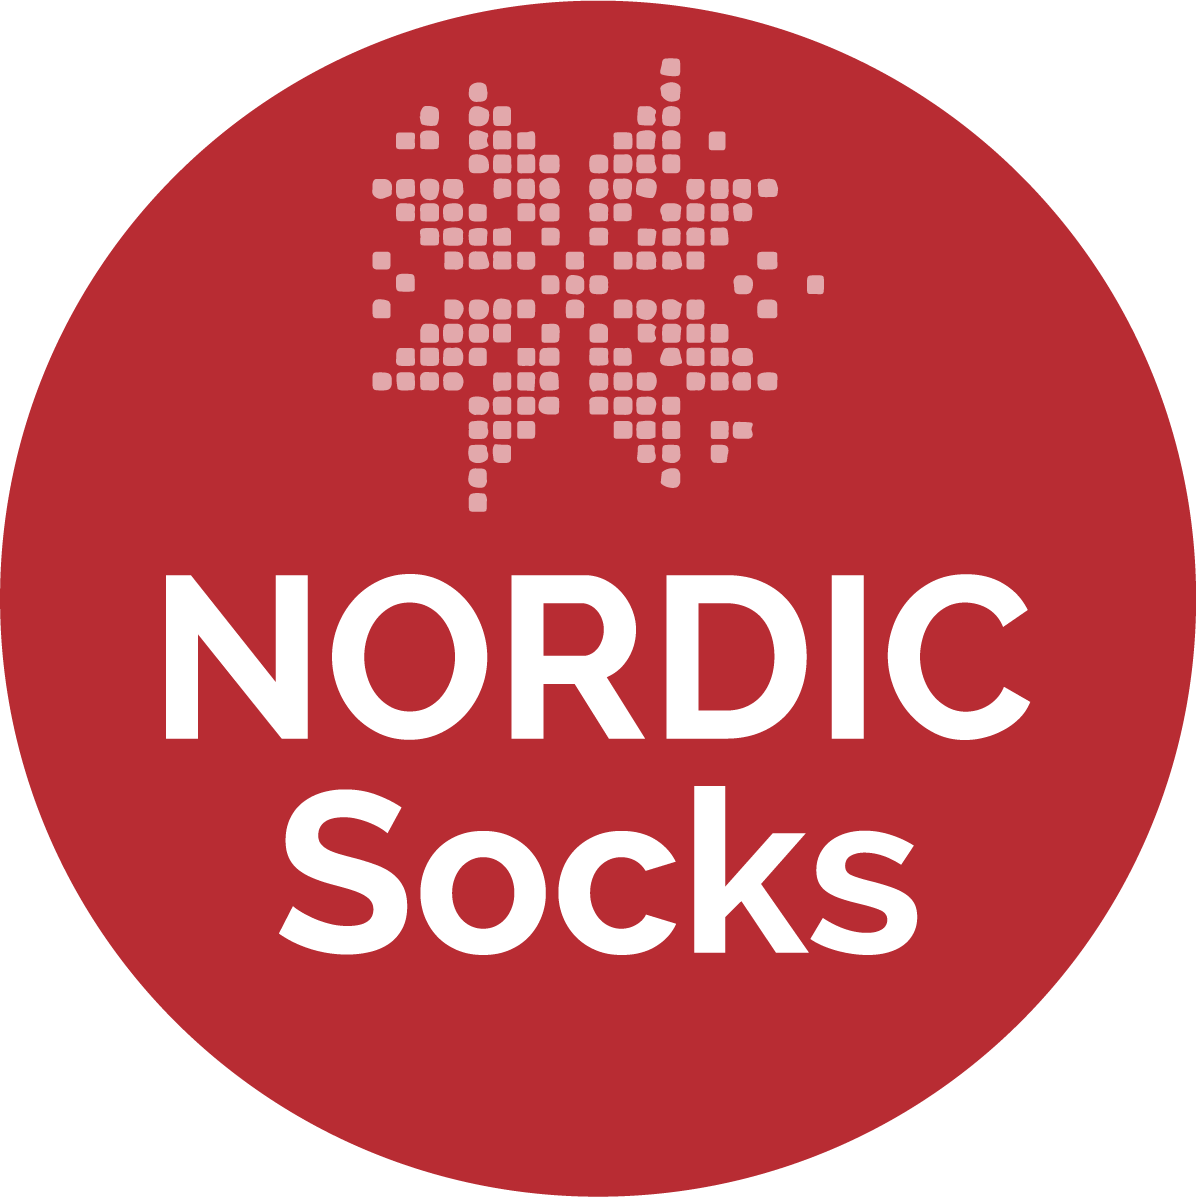 The nordic socks